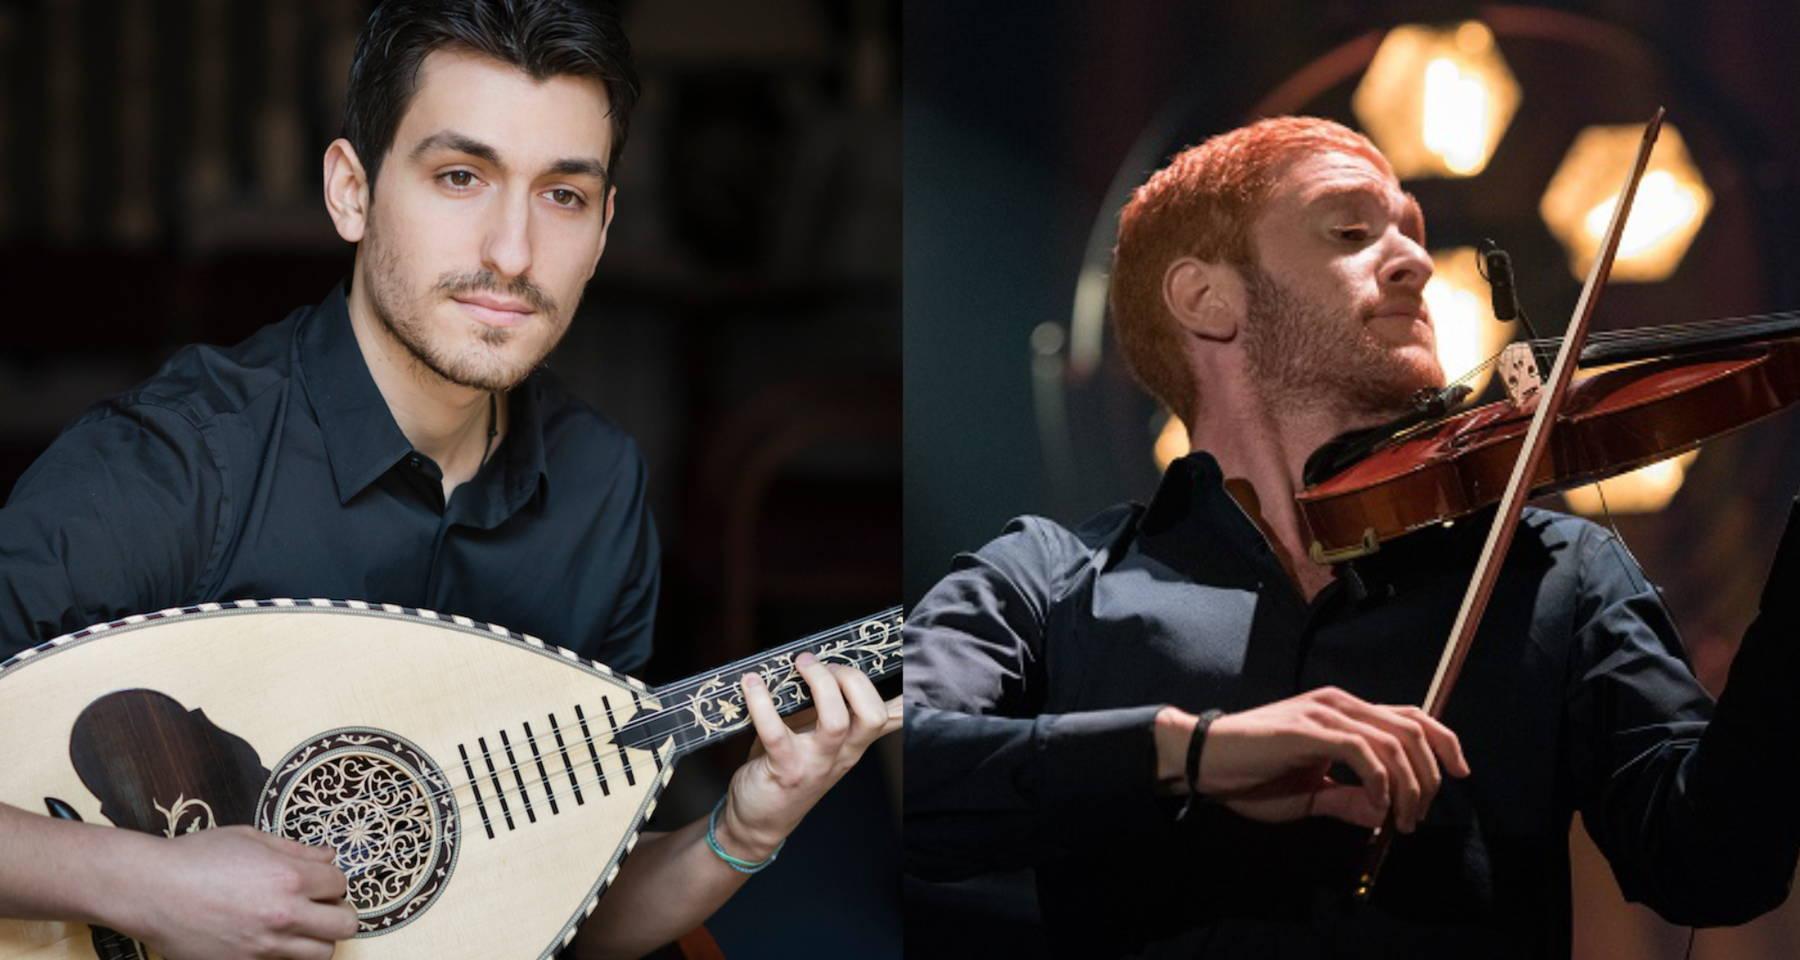 Vasilis Kostas & Layth Sidiq Duo